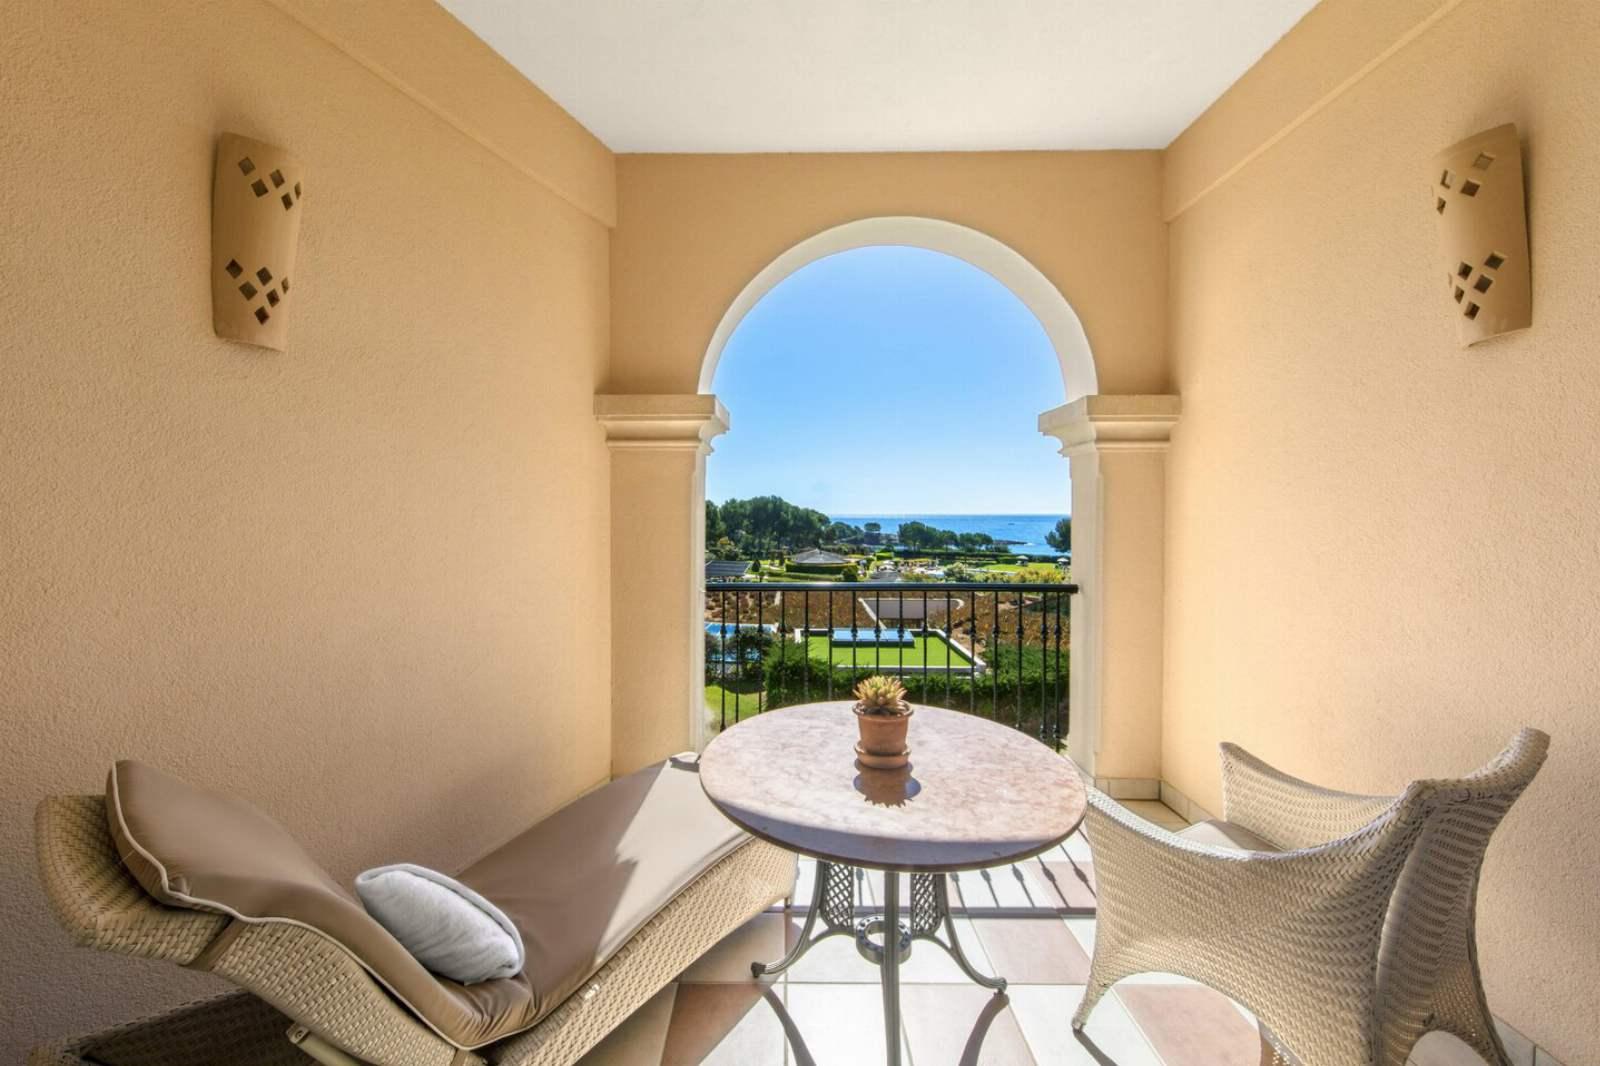 St. Regis Mardavall Resort - Grand Deluxe Room, Sea View